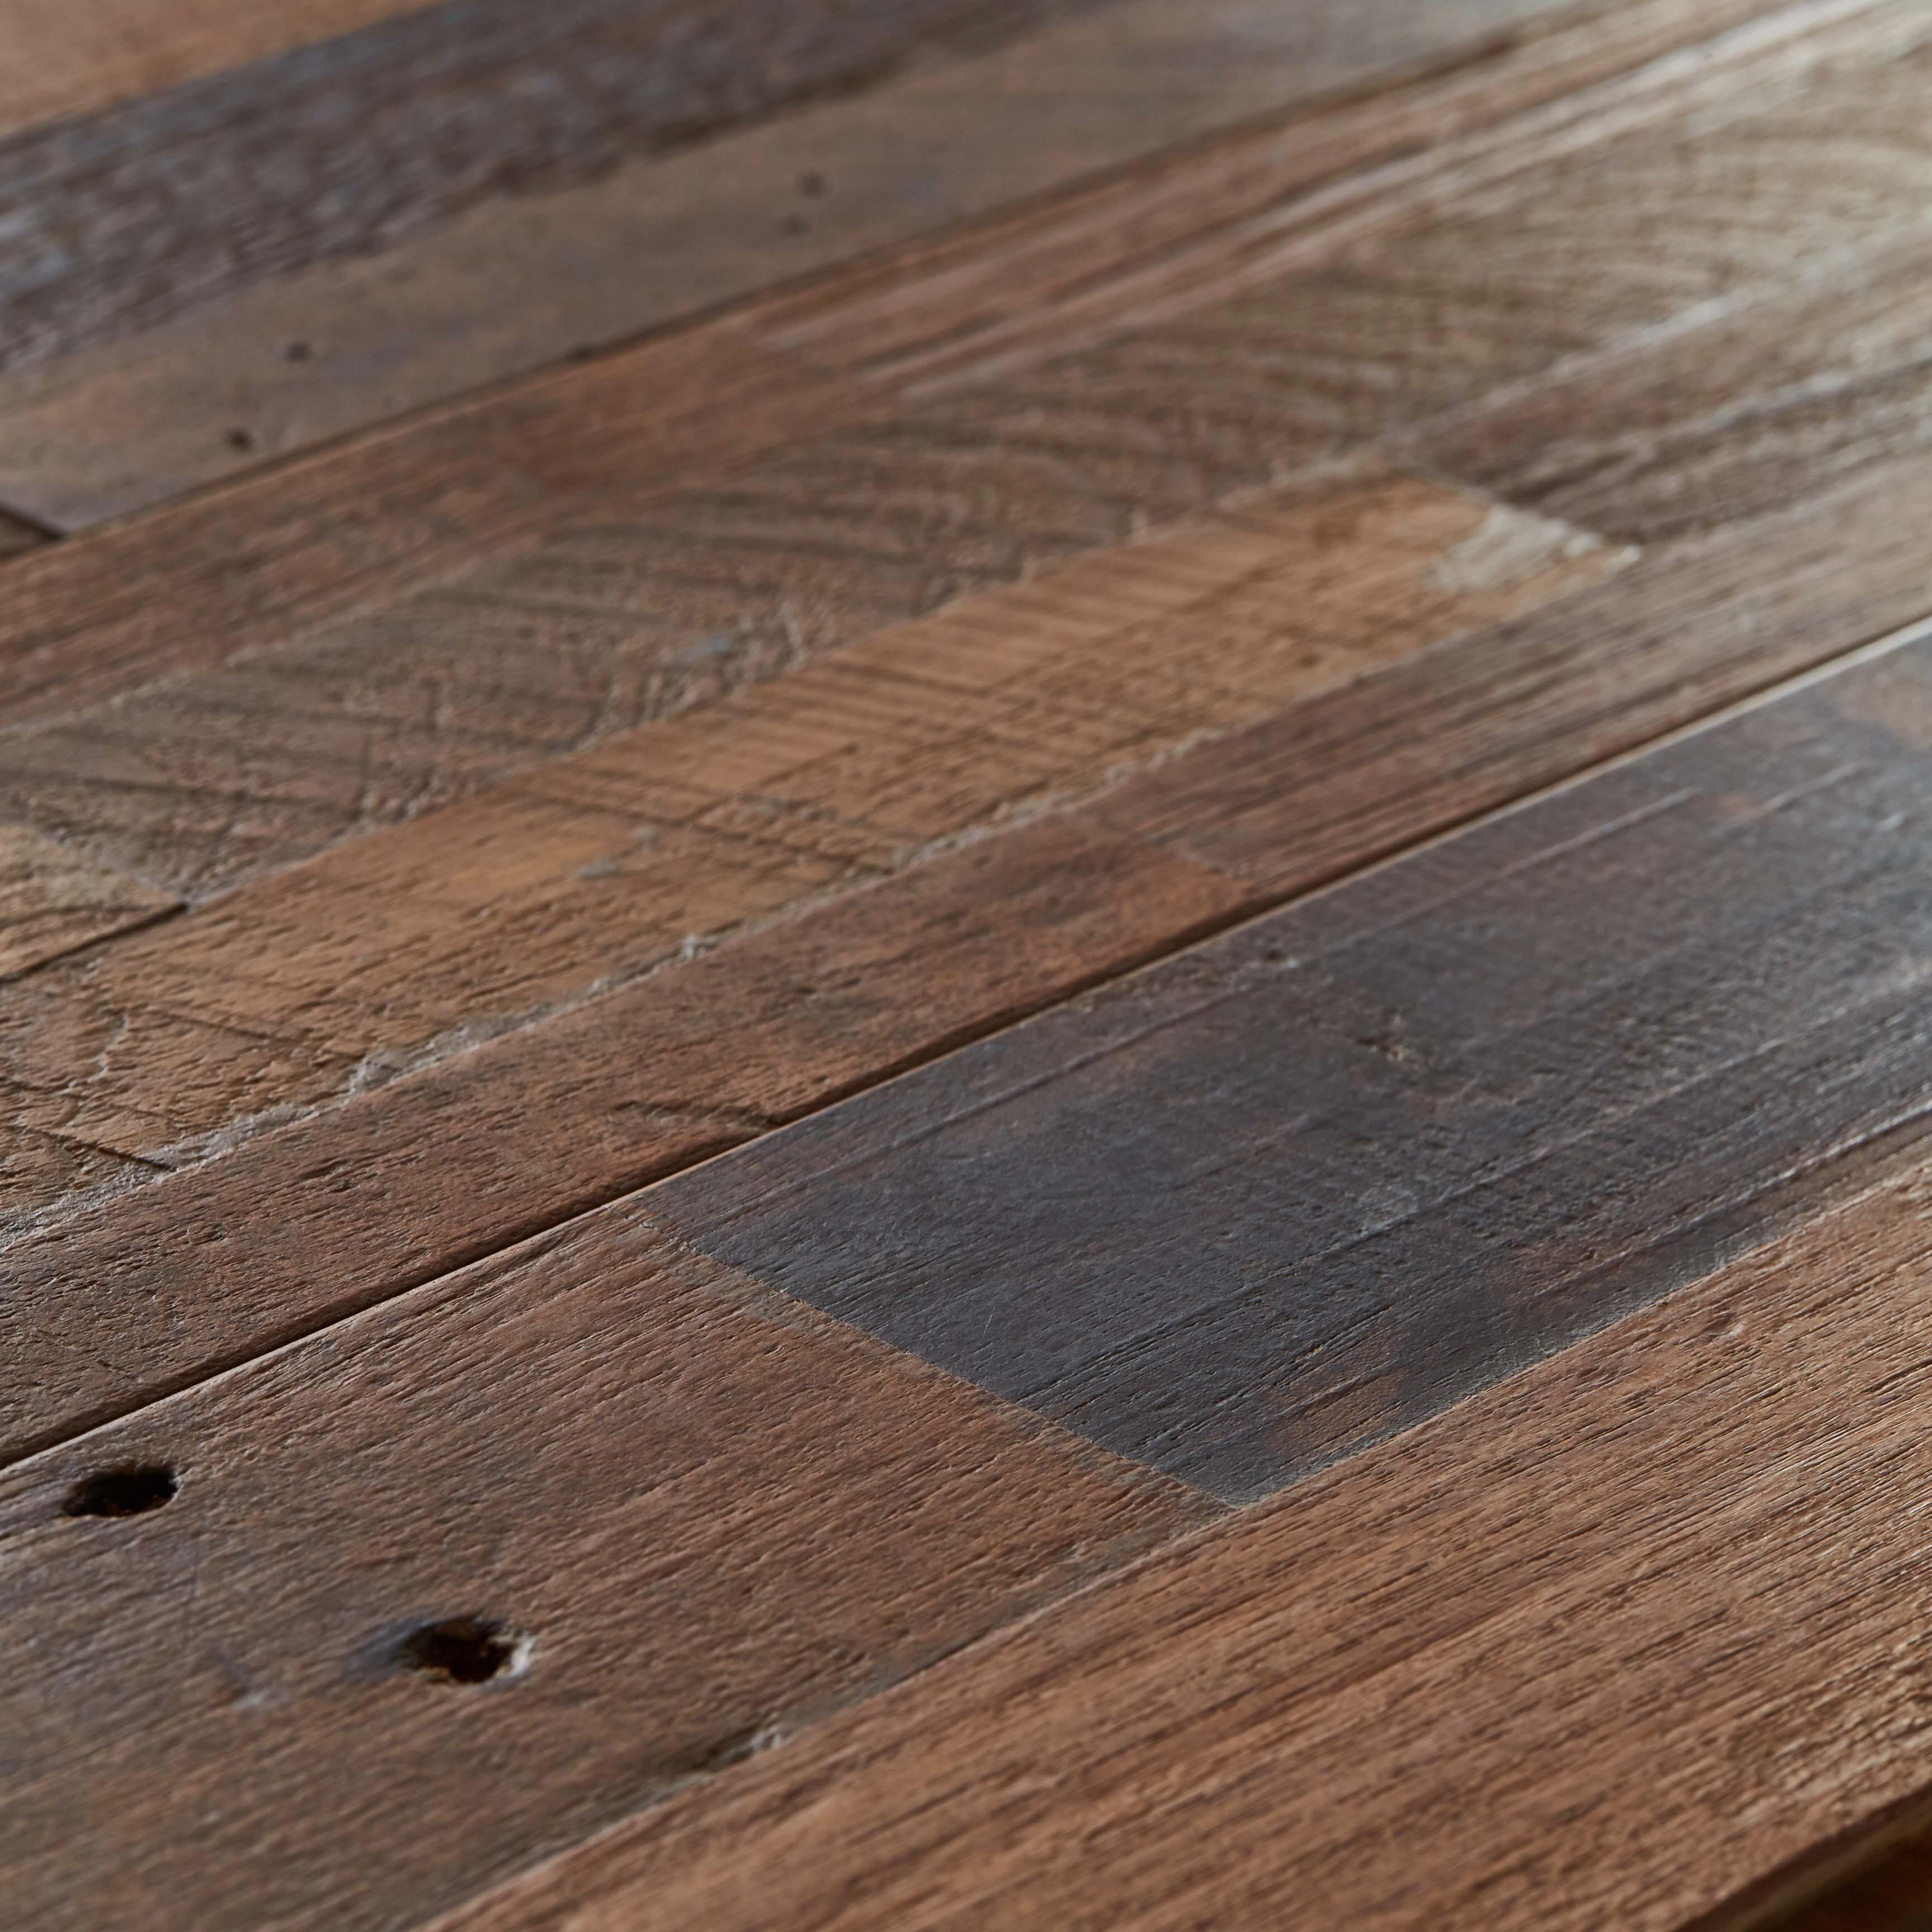 multistrip patina finish - Reclaimed Teak Flooring